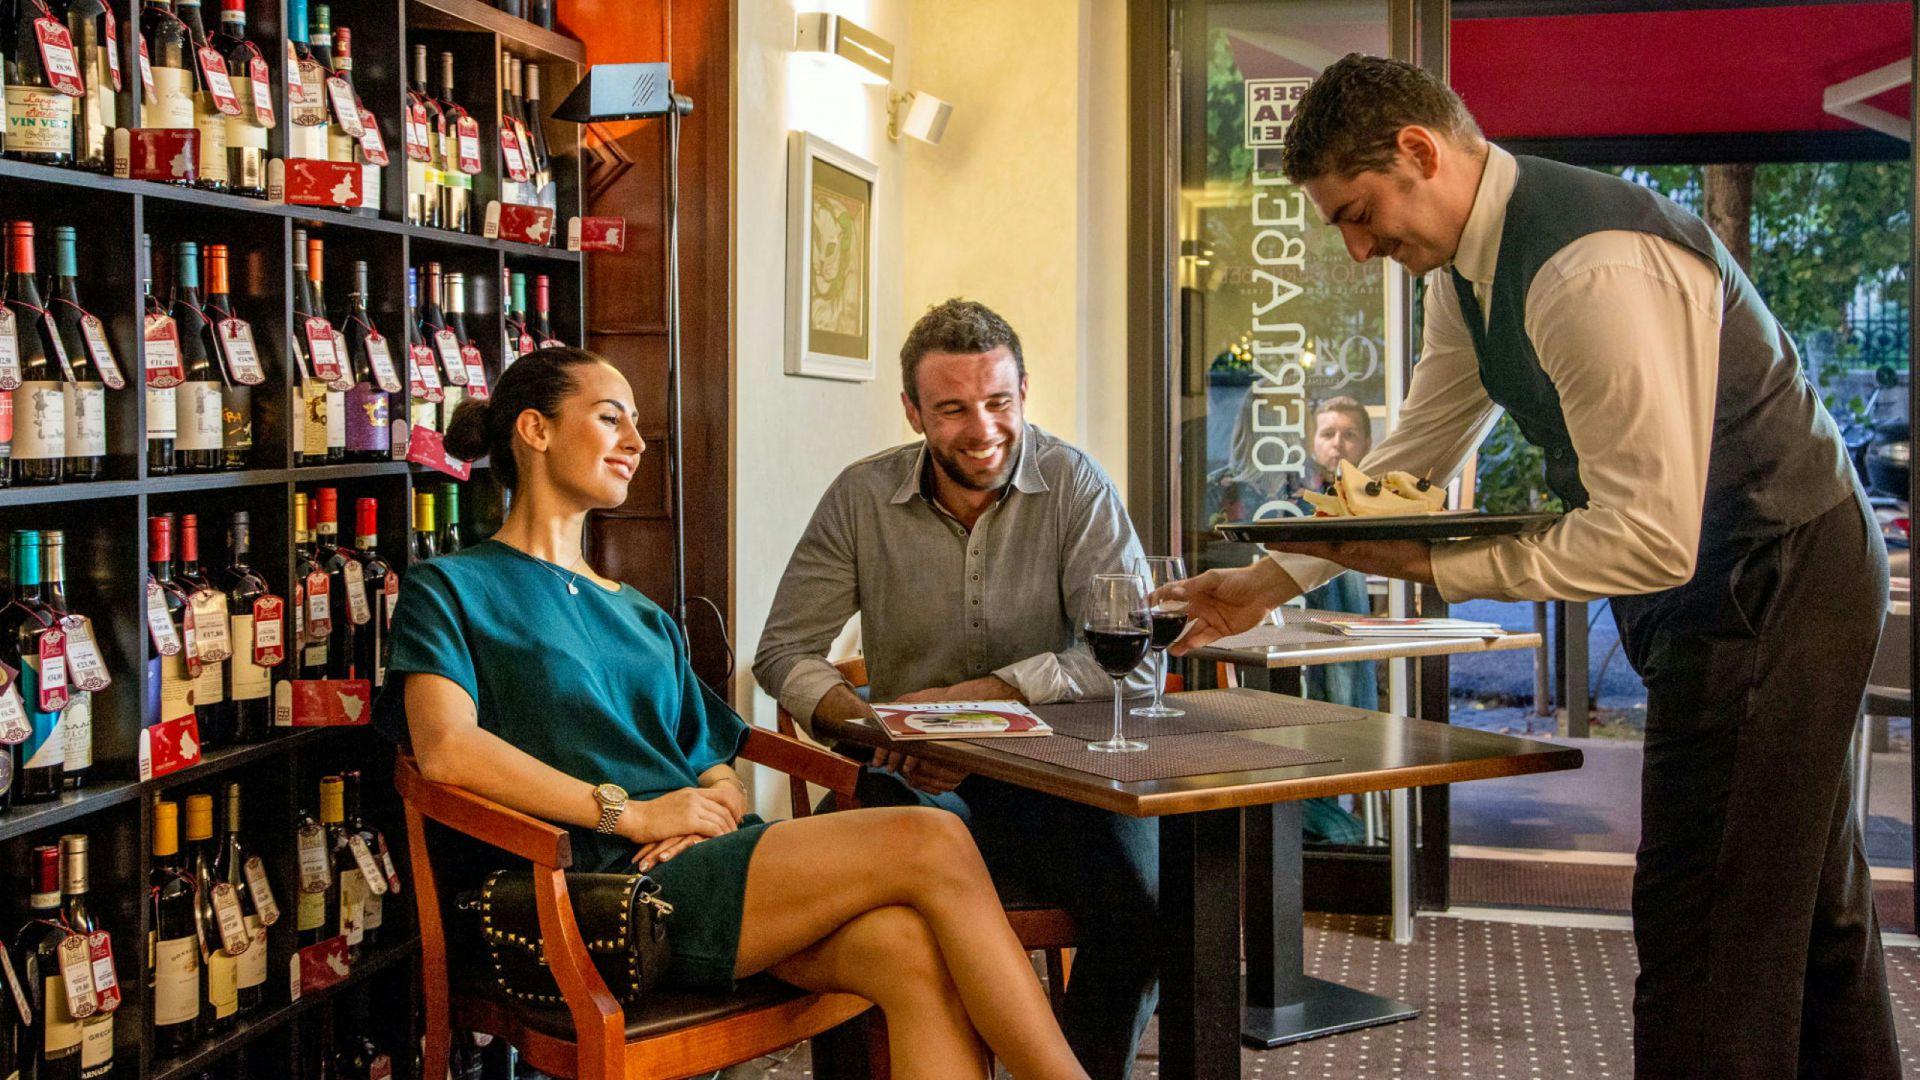 Foto-Hotel-Oxford-Roma-bar-de-vinhos-12